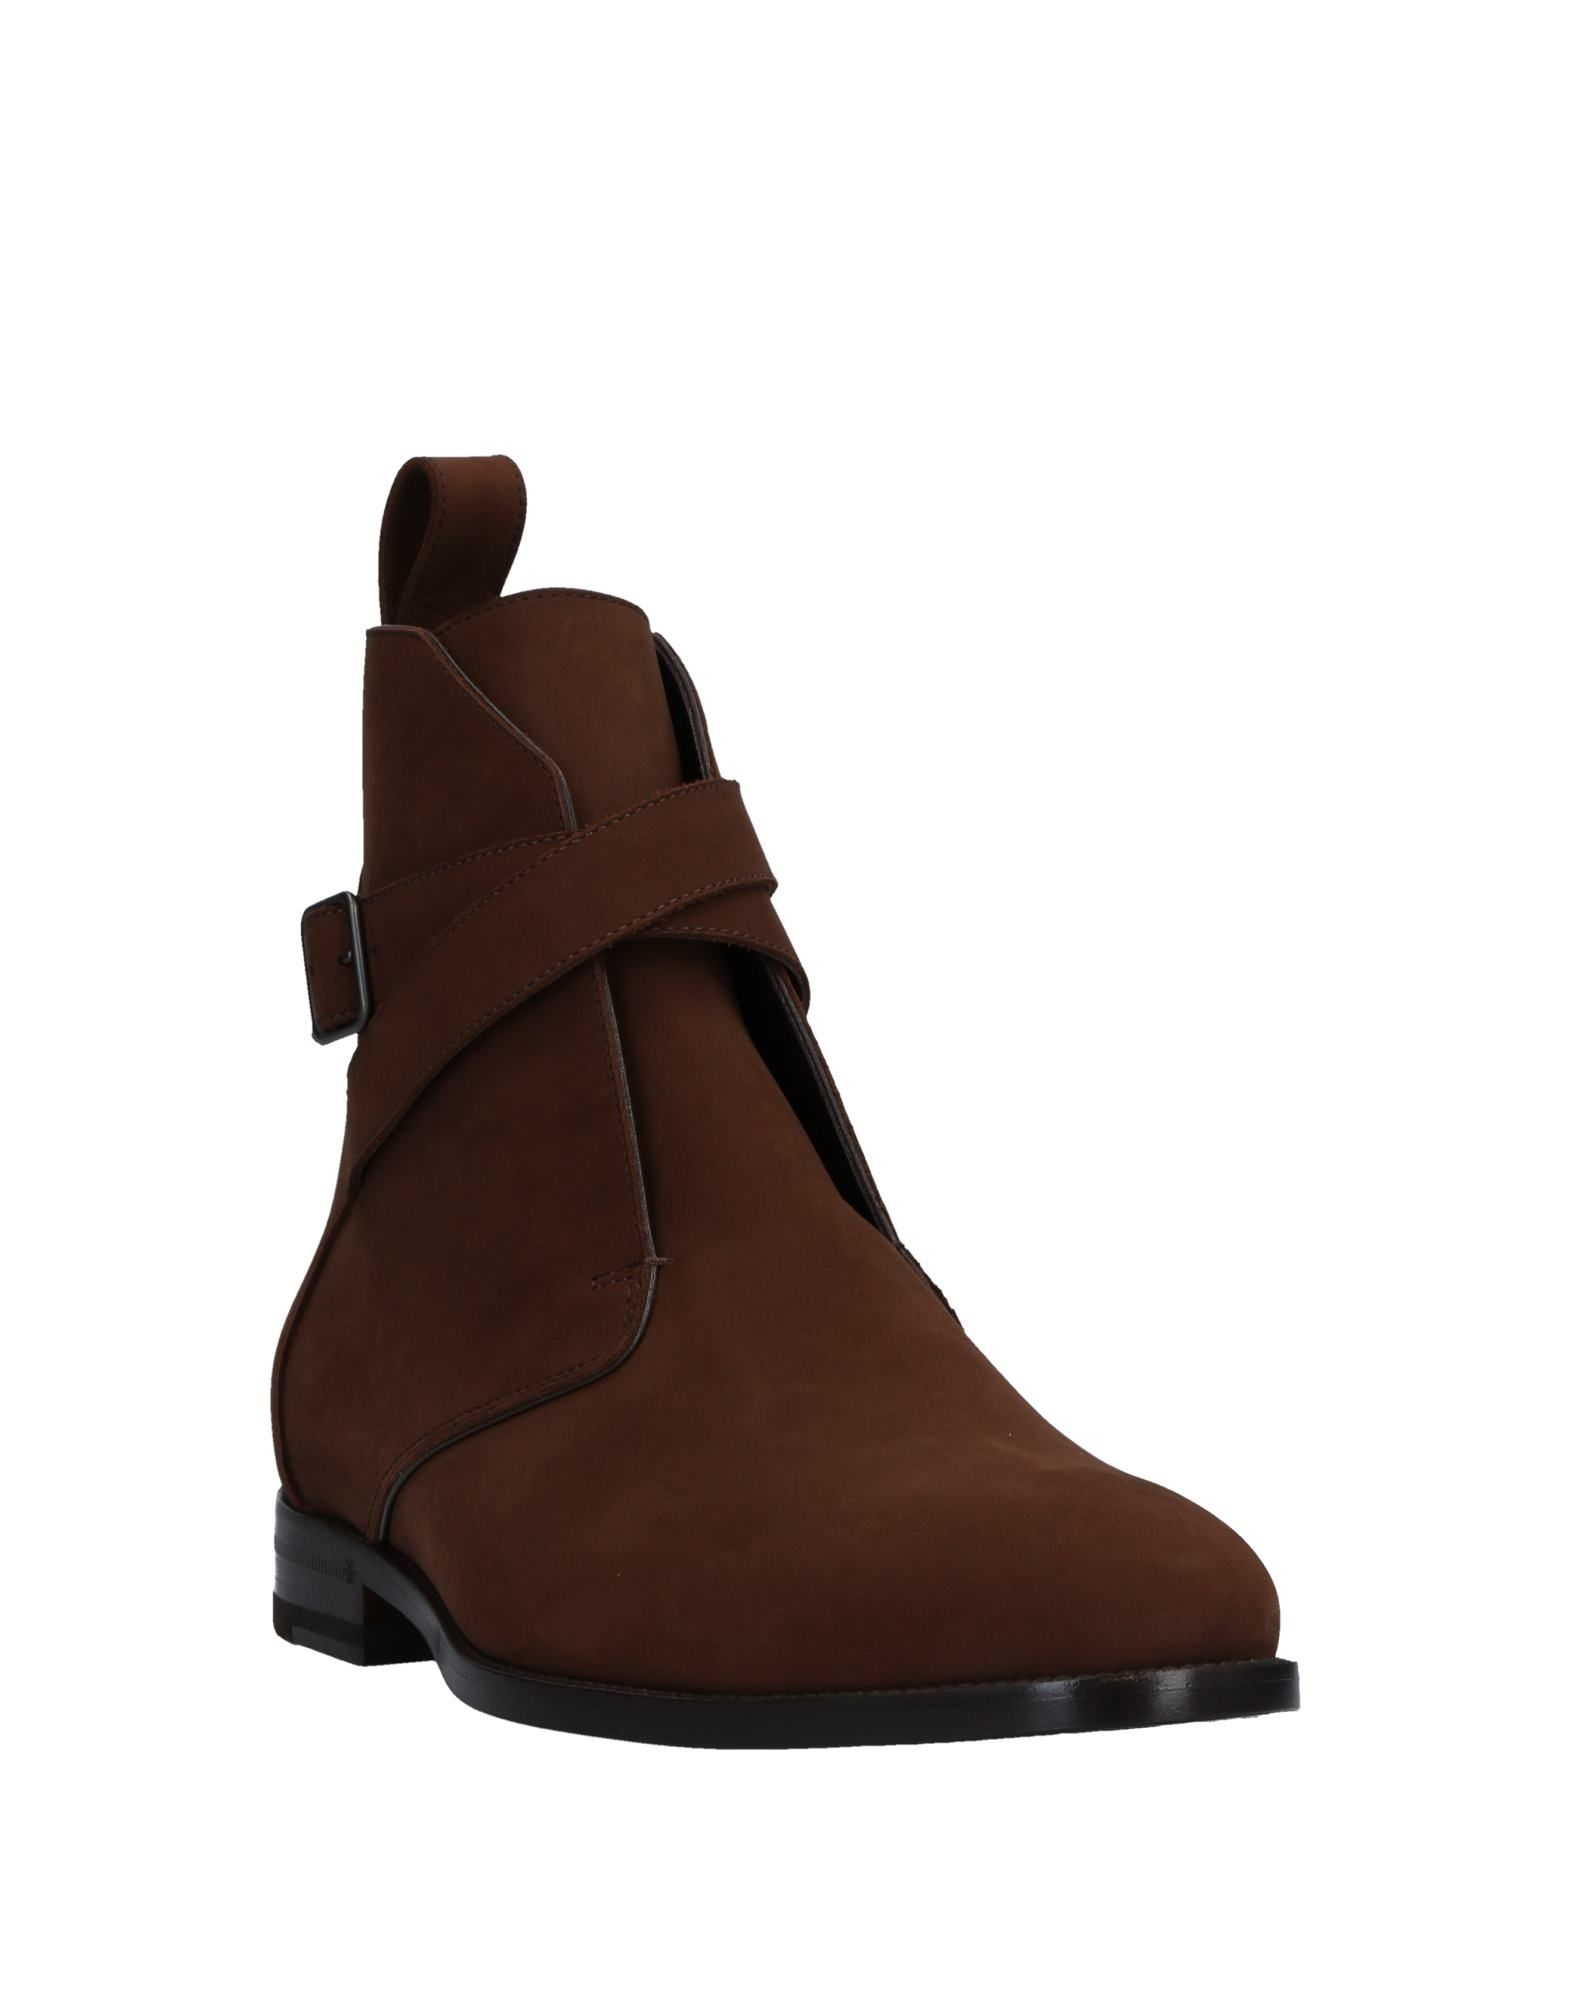 Saint Laurent Stiefelette Herren beliebte  11521118AG Gute Qualität beliebte Herren Schuhe dcf0bb